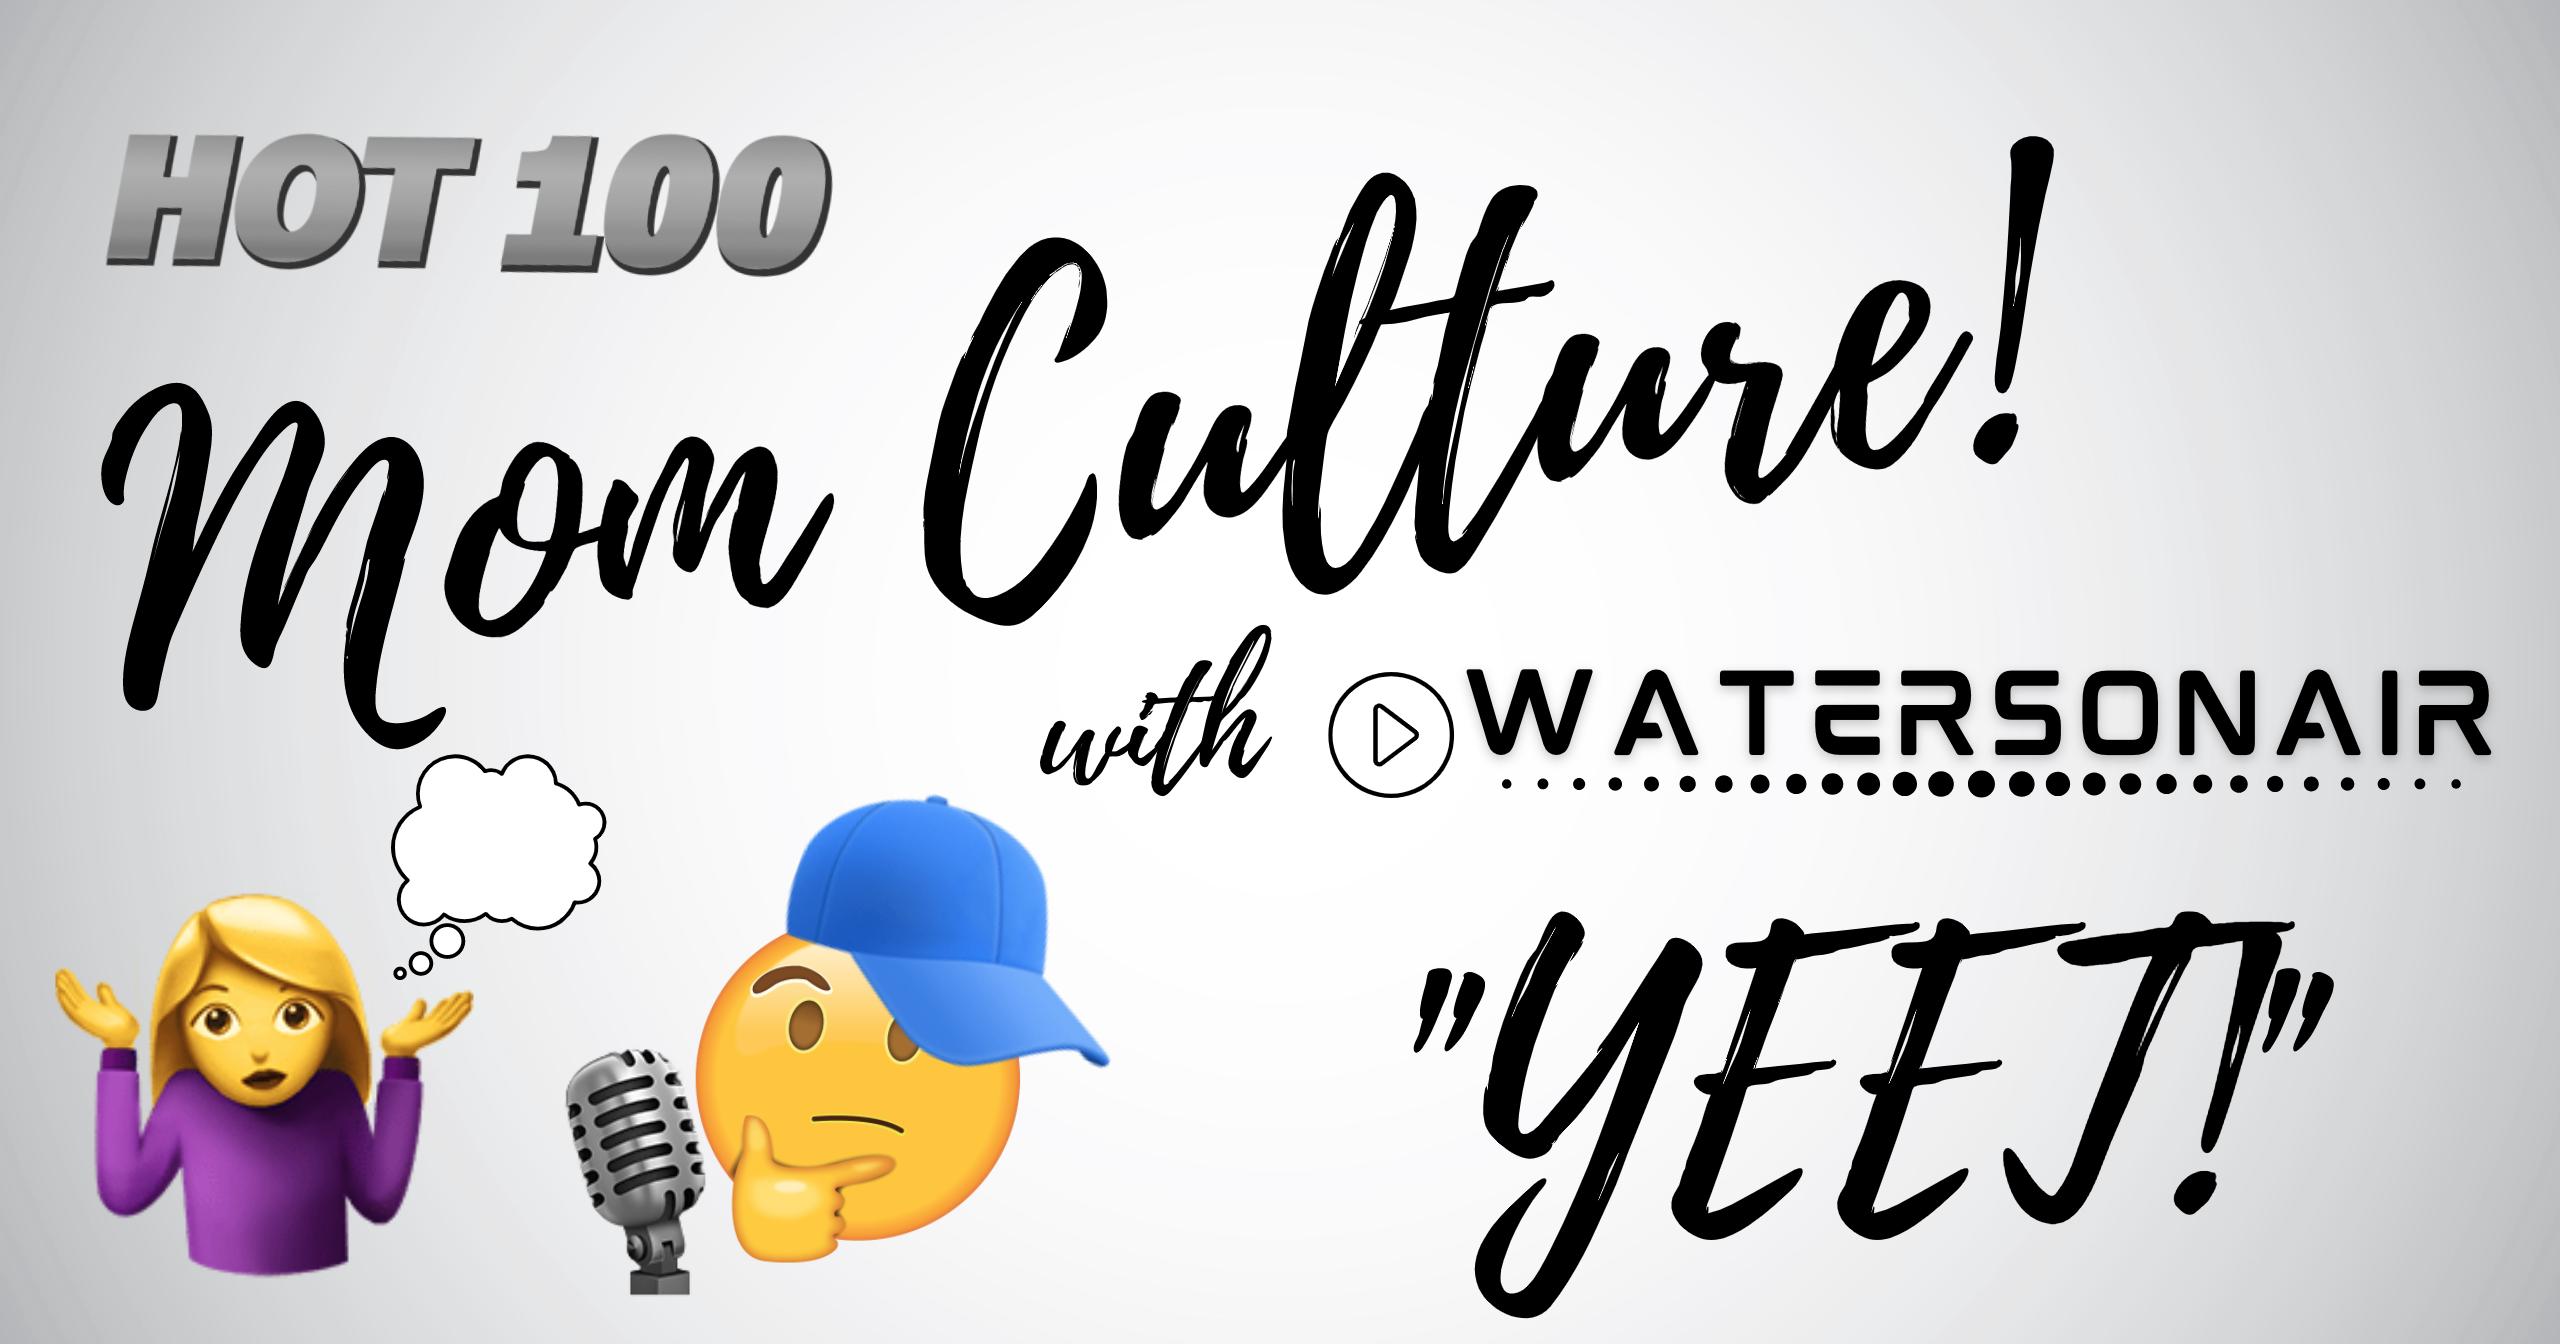 Mom Culture 7/19 – YEET!